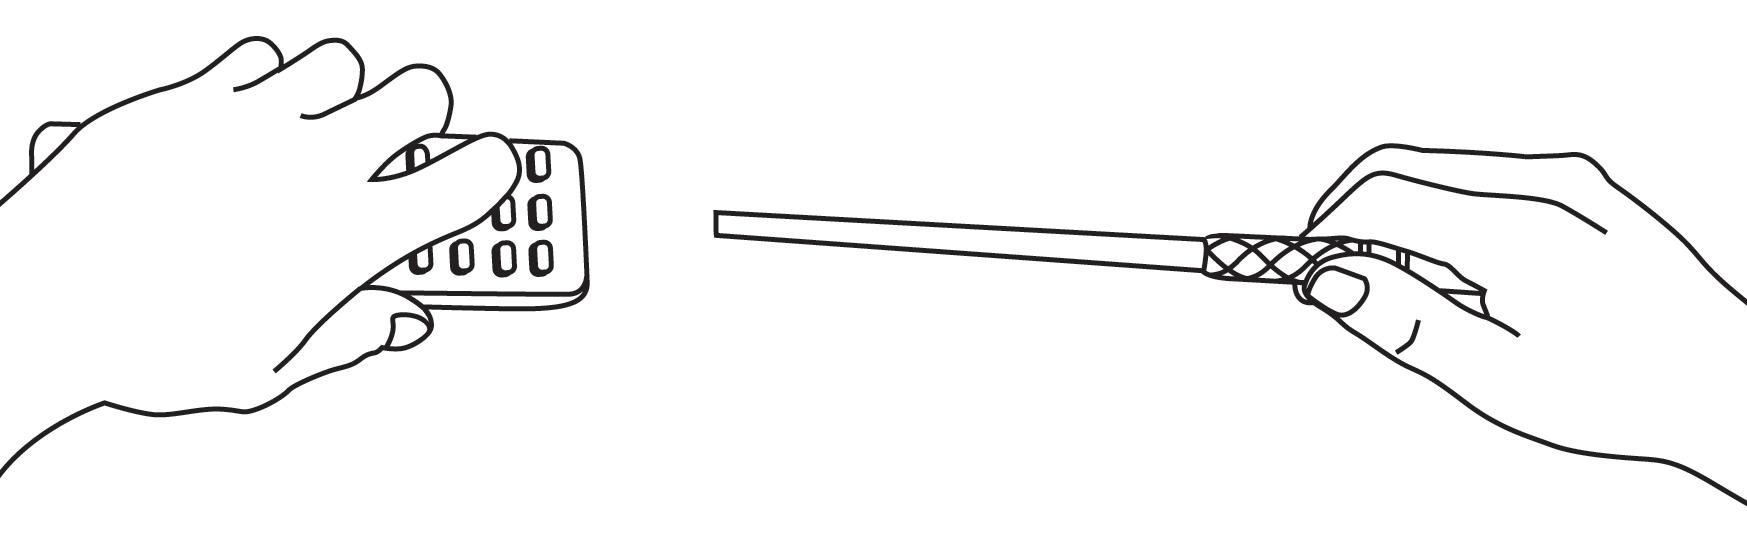 Programming the wand